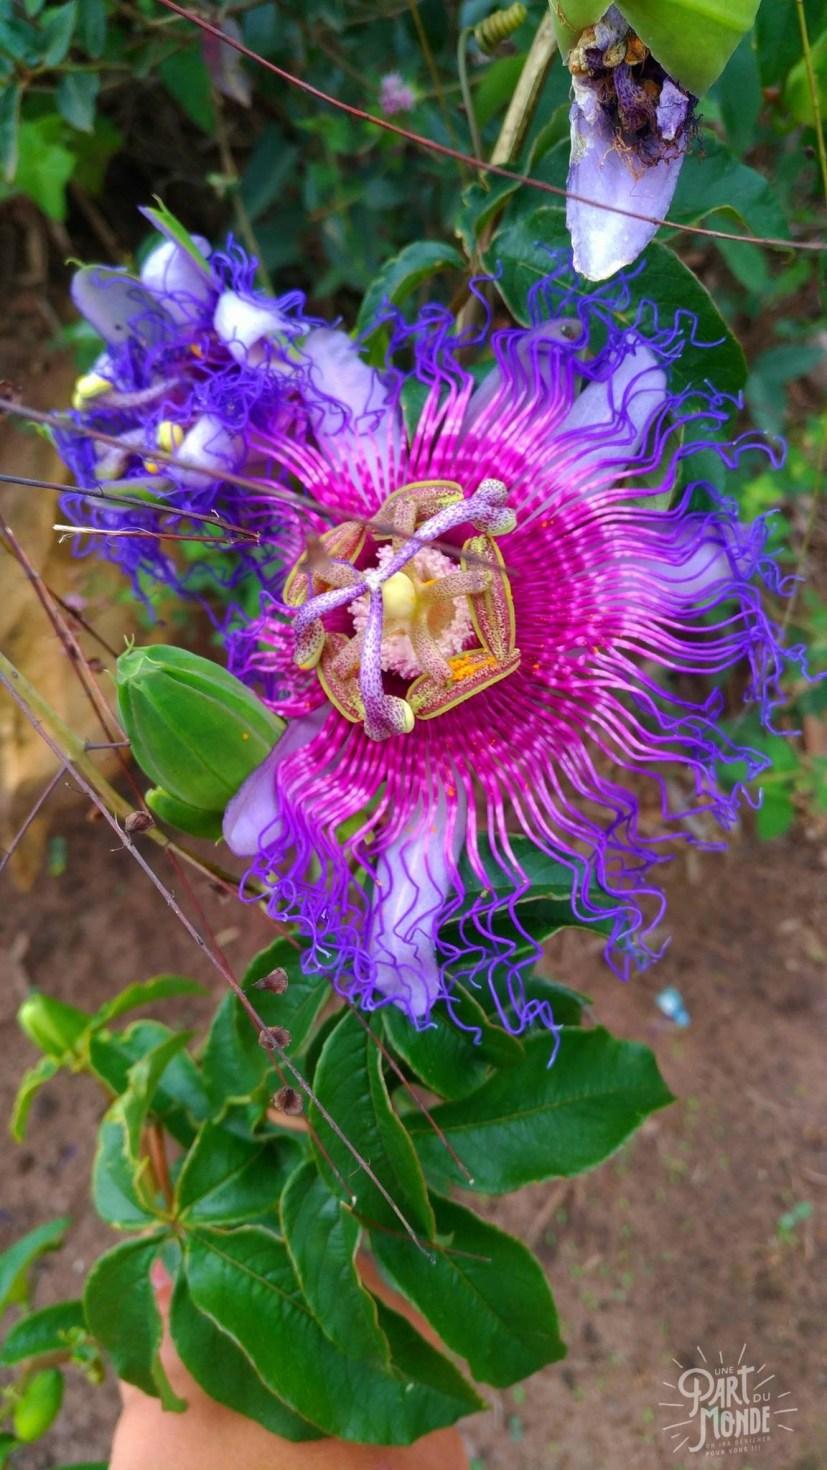 chapada diamantina fleur de fruit de la passion